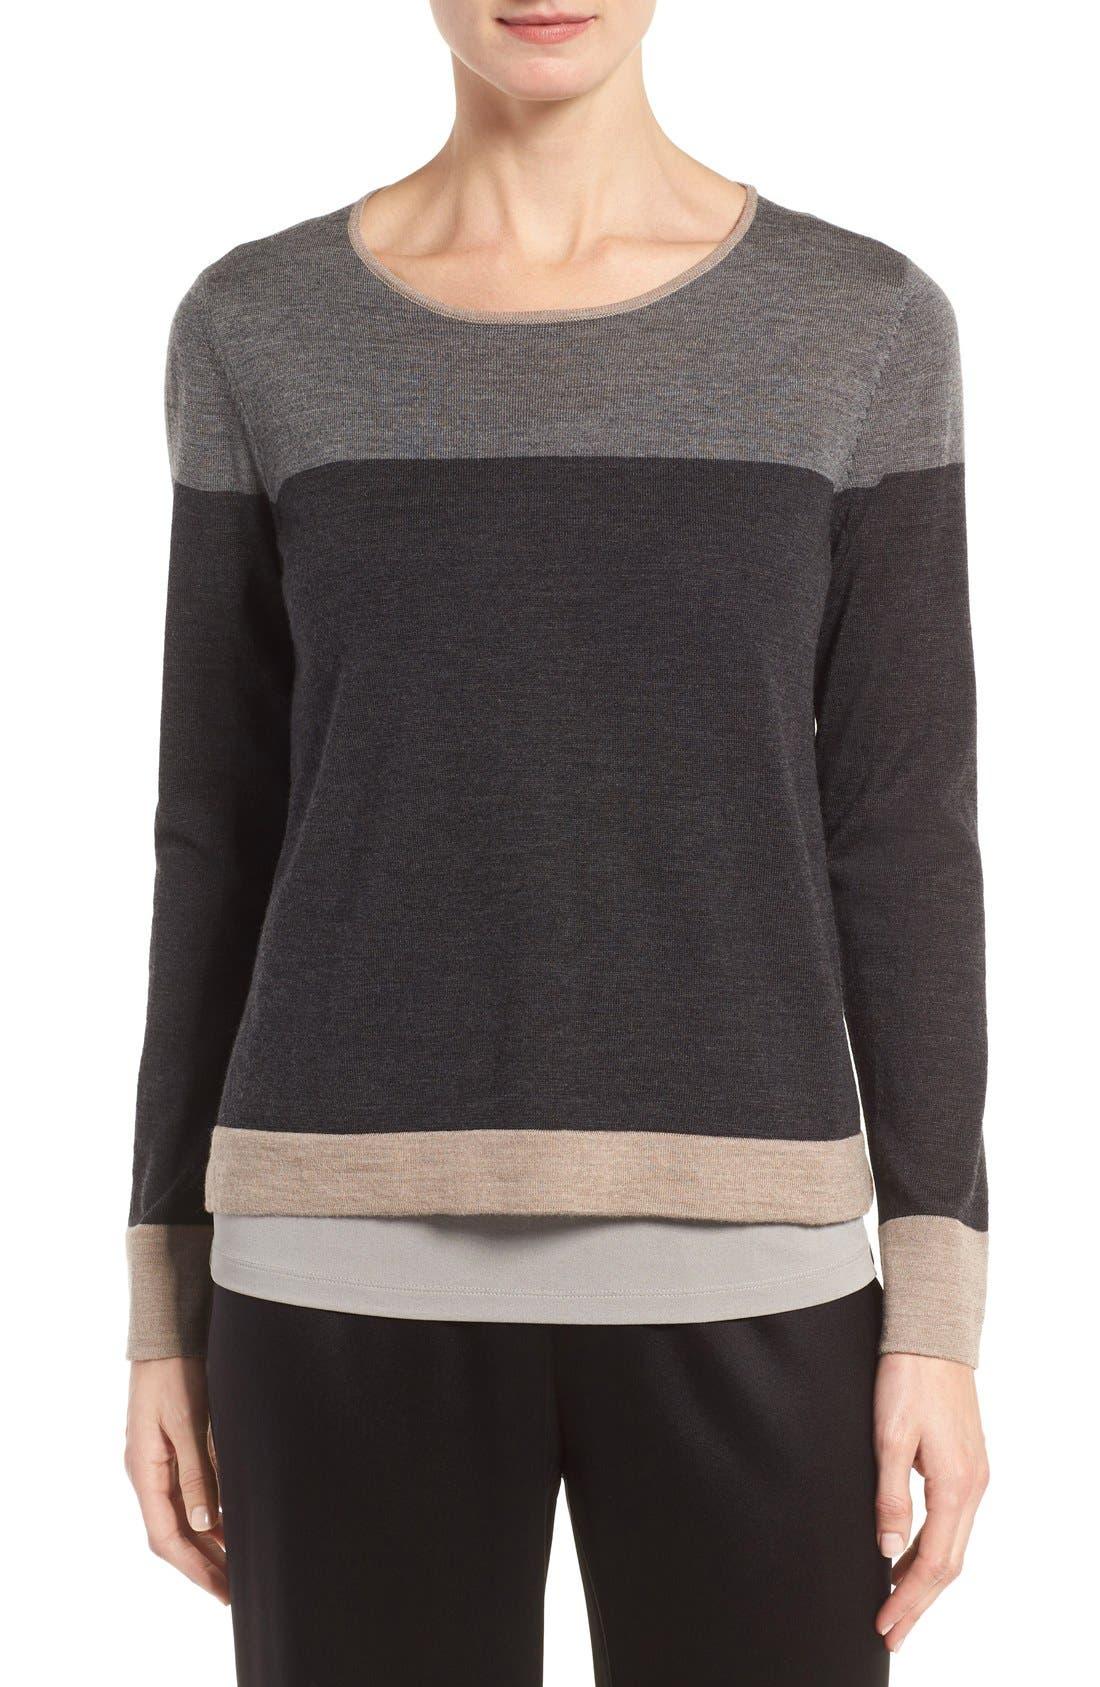 Alternate Image 1 Selected - Eileen Fisher Colorblock Merino Wool Sweater (Regular & Petite)